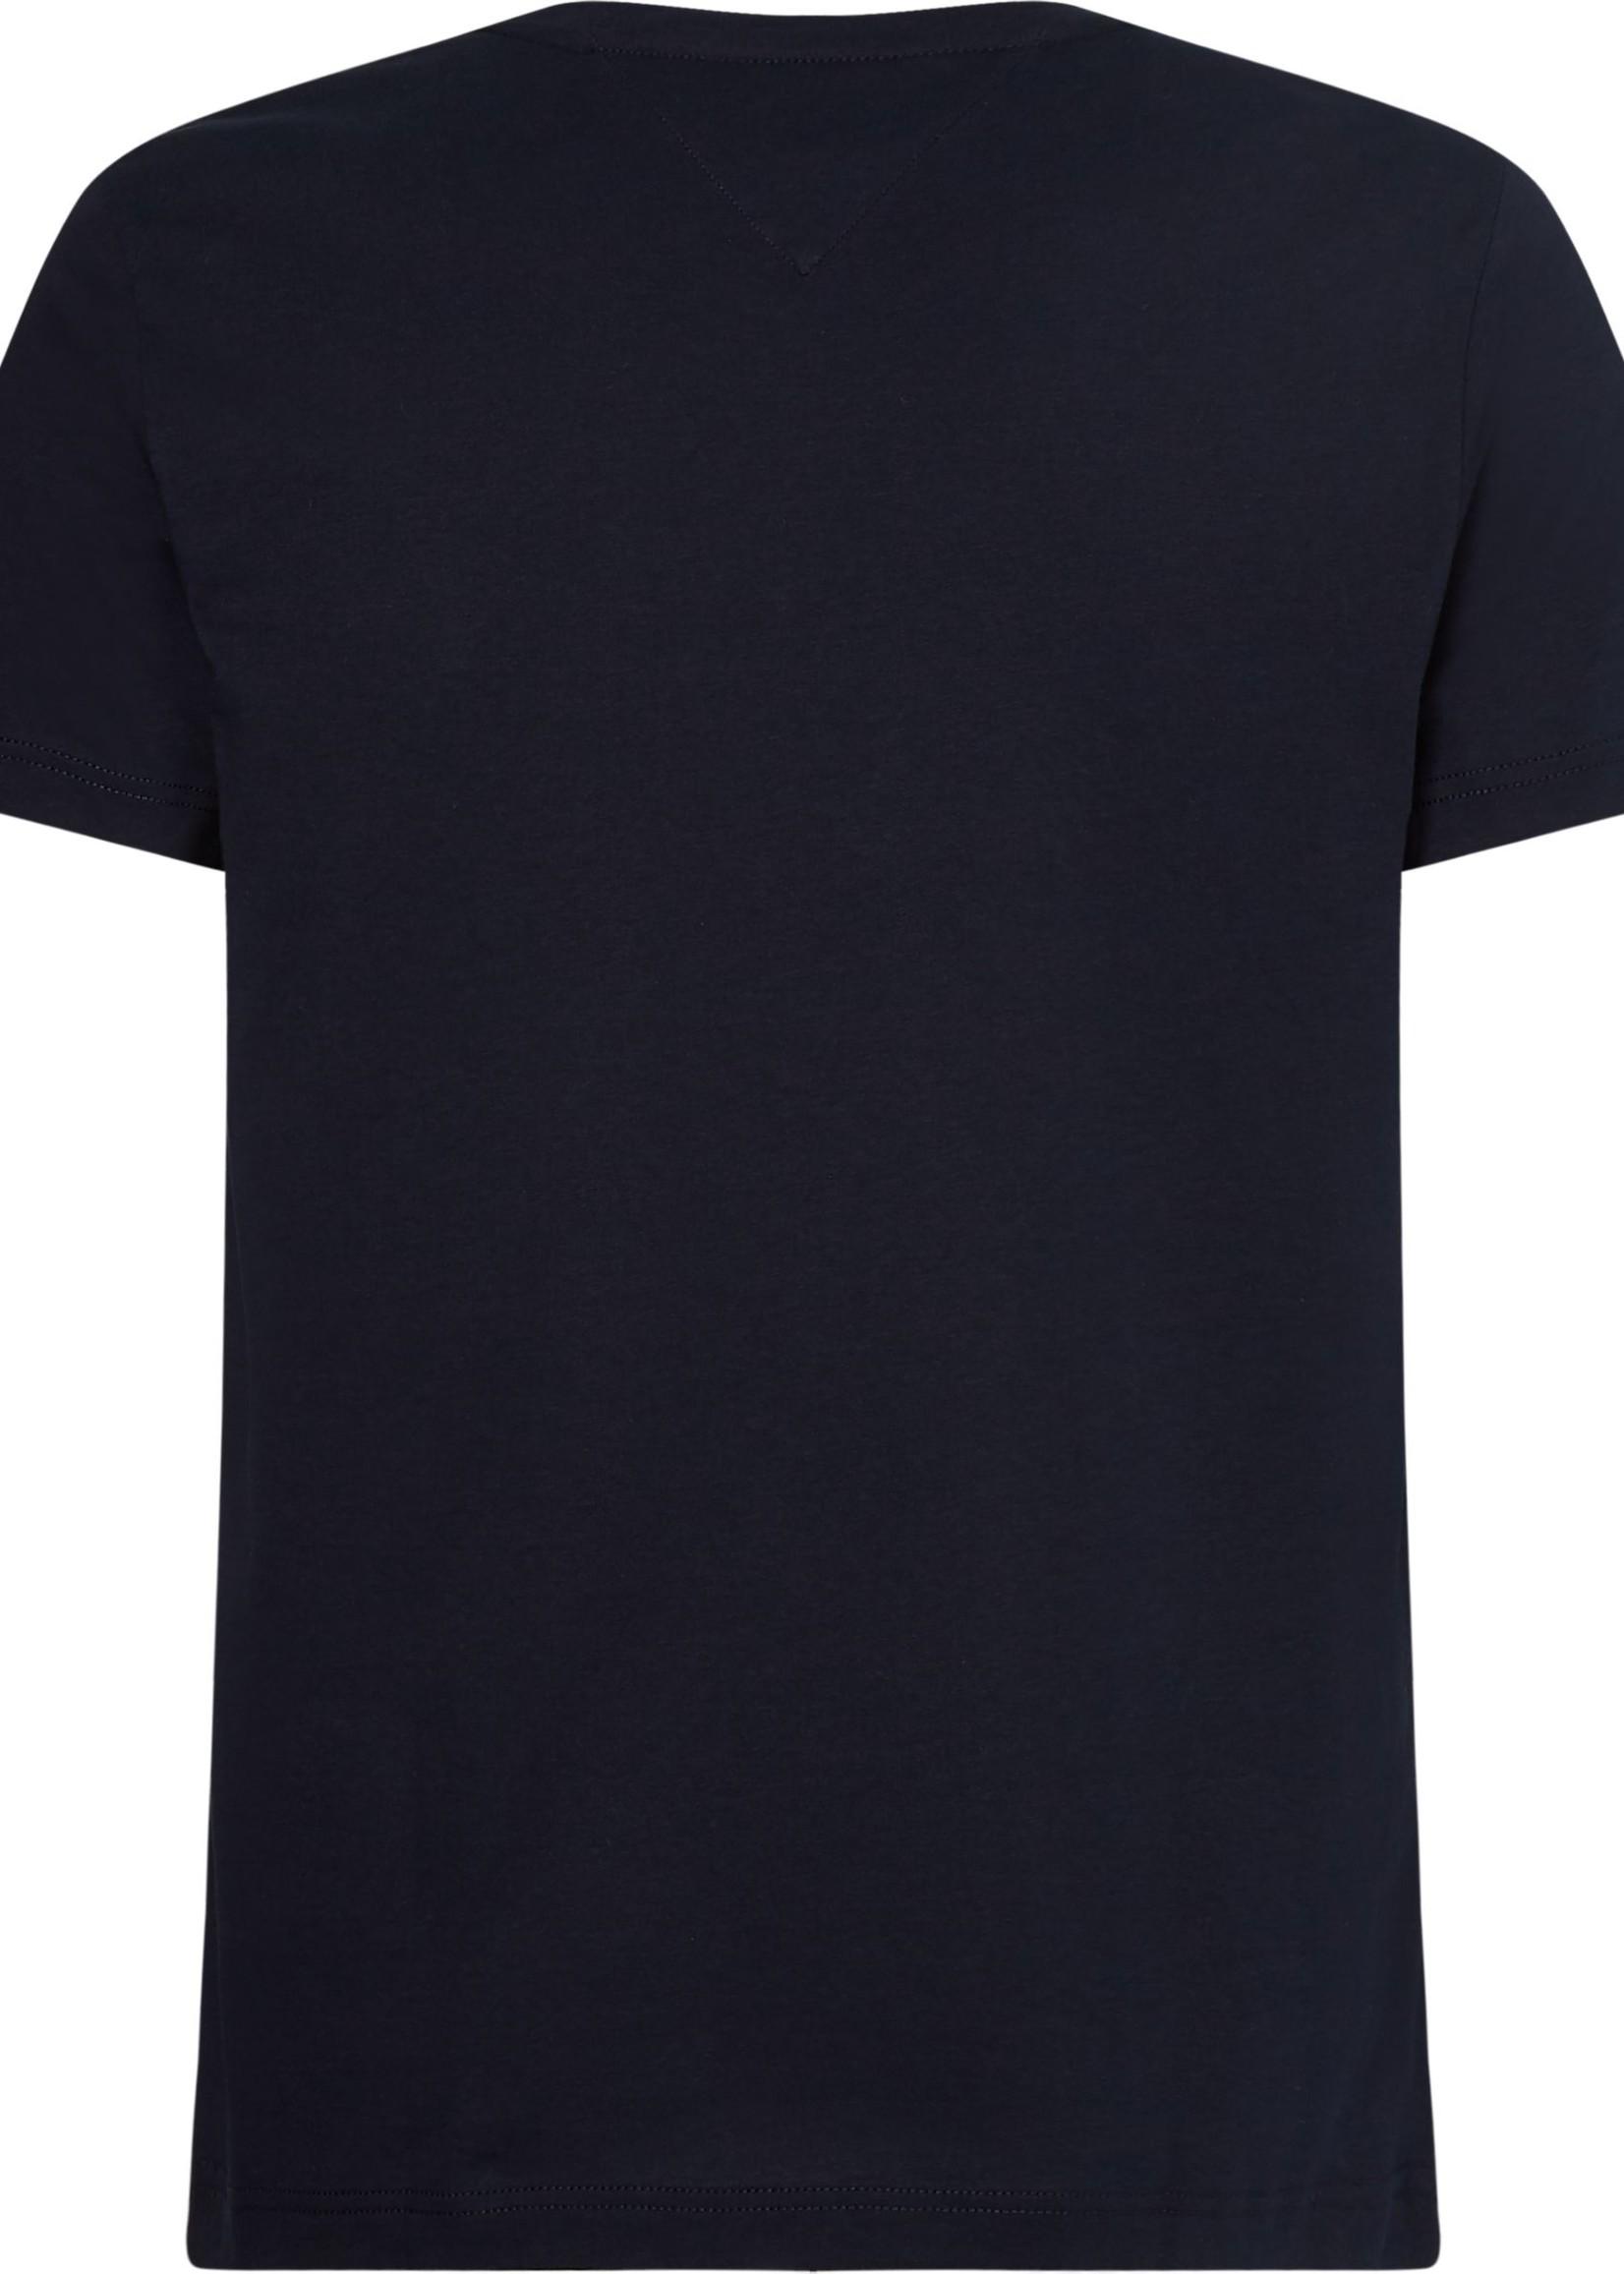 Tommy Hilfiger Signature Detailing Organic Cotton T-Shirt | Blue | Tommy Hilfiger